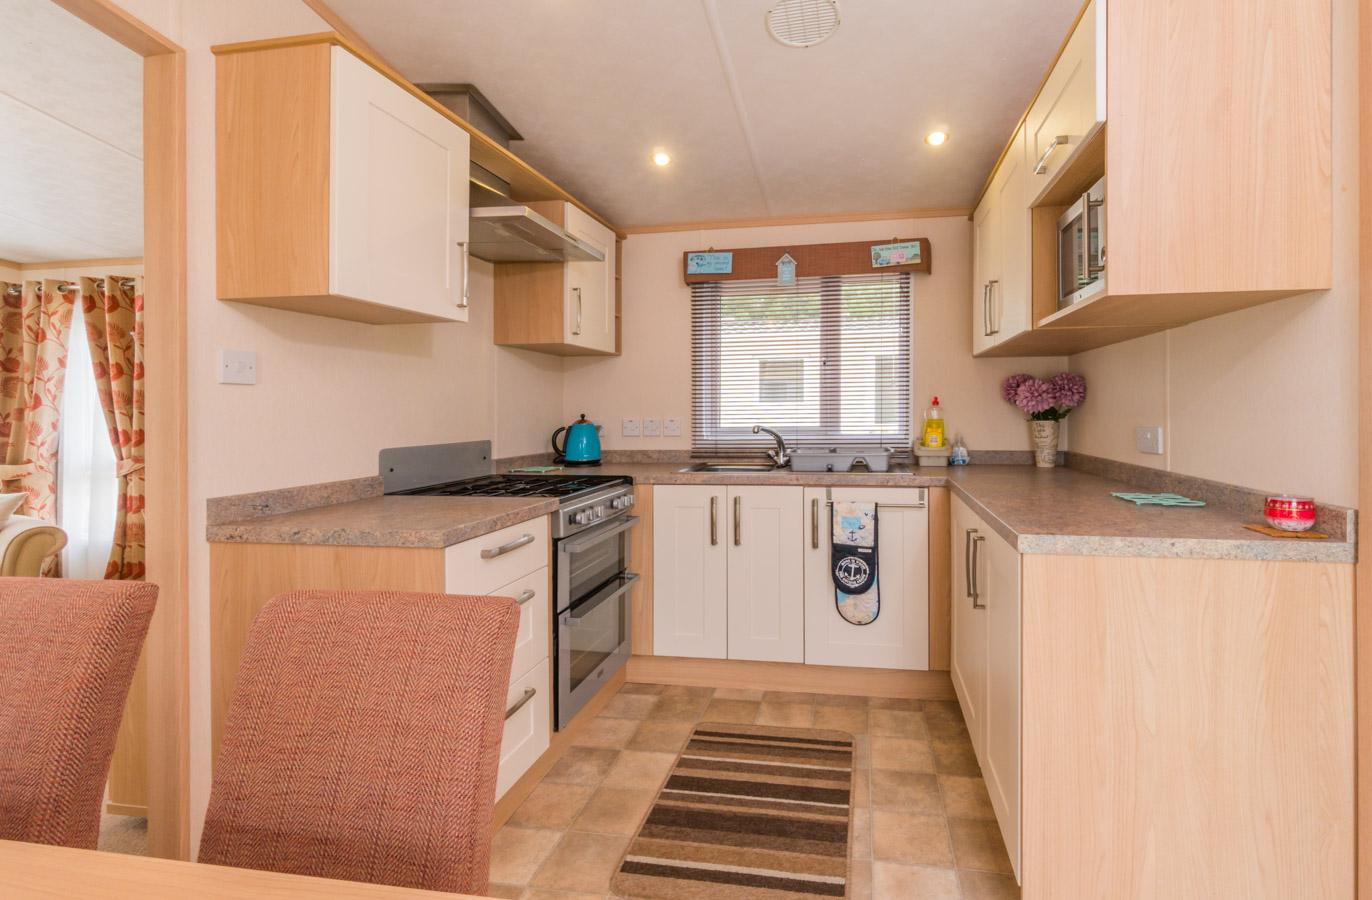 Neil-Bigwood-Monkton-Wyld-Holiday-Homes-06